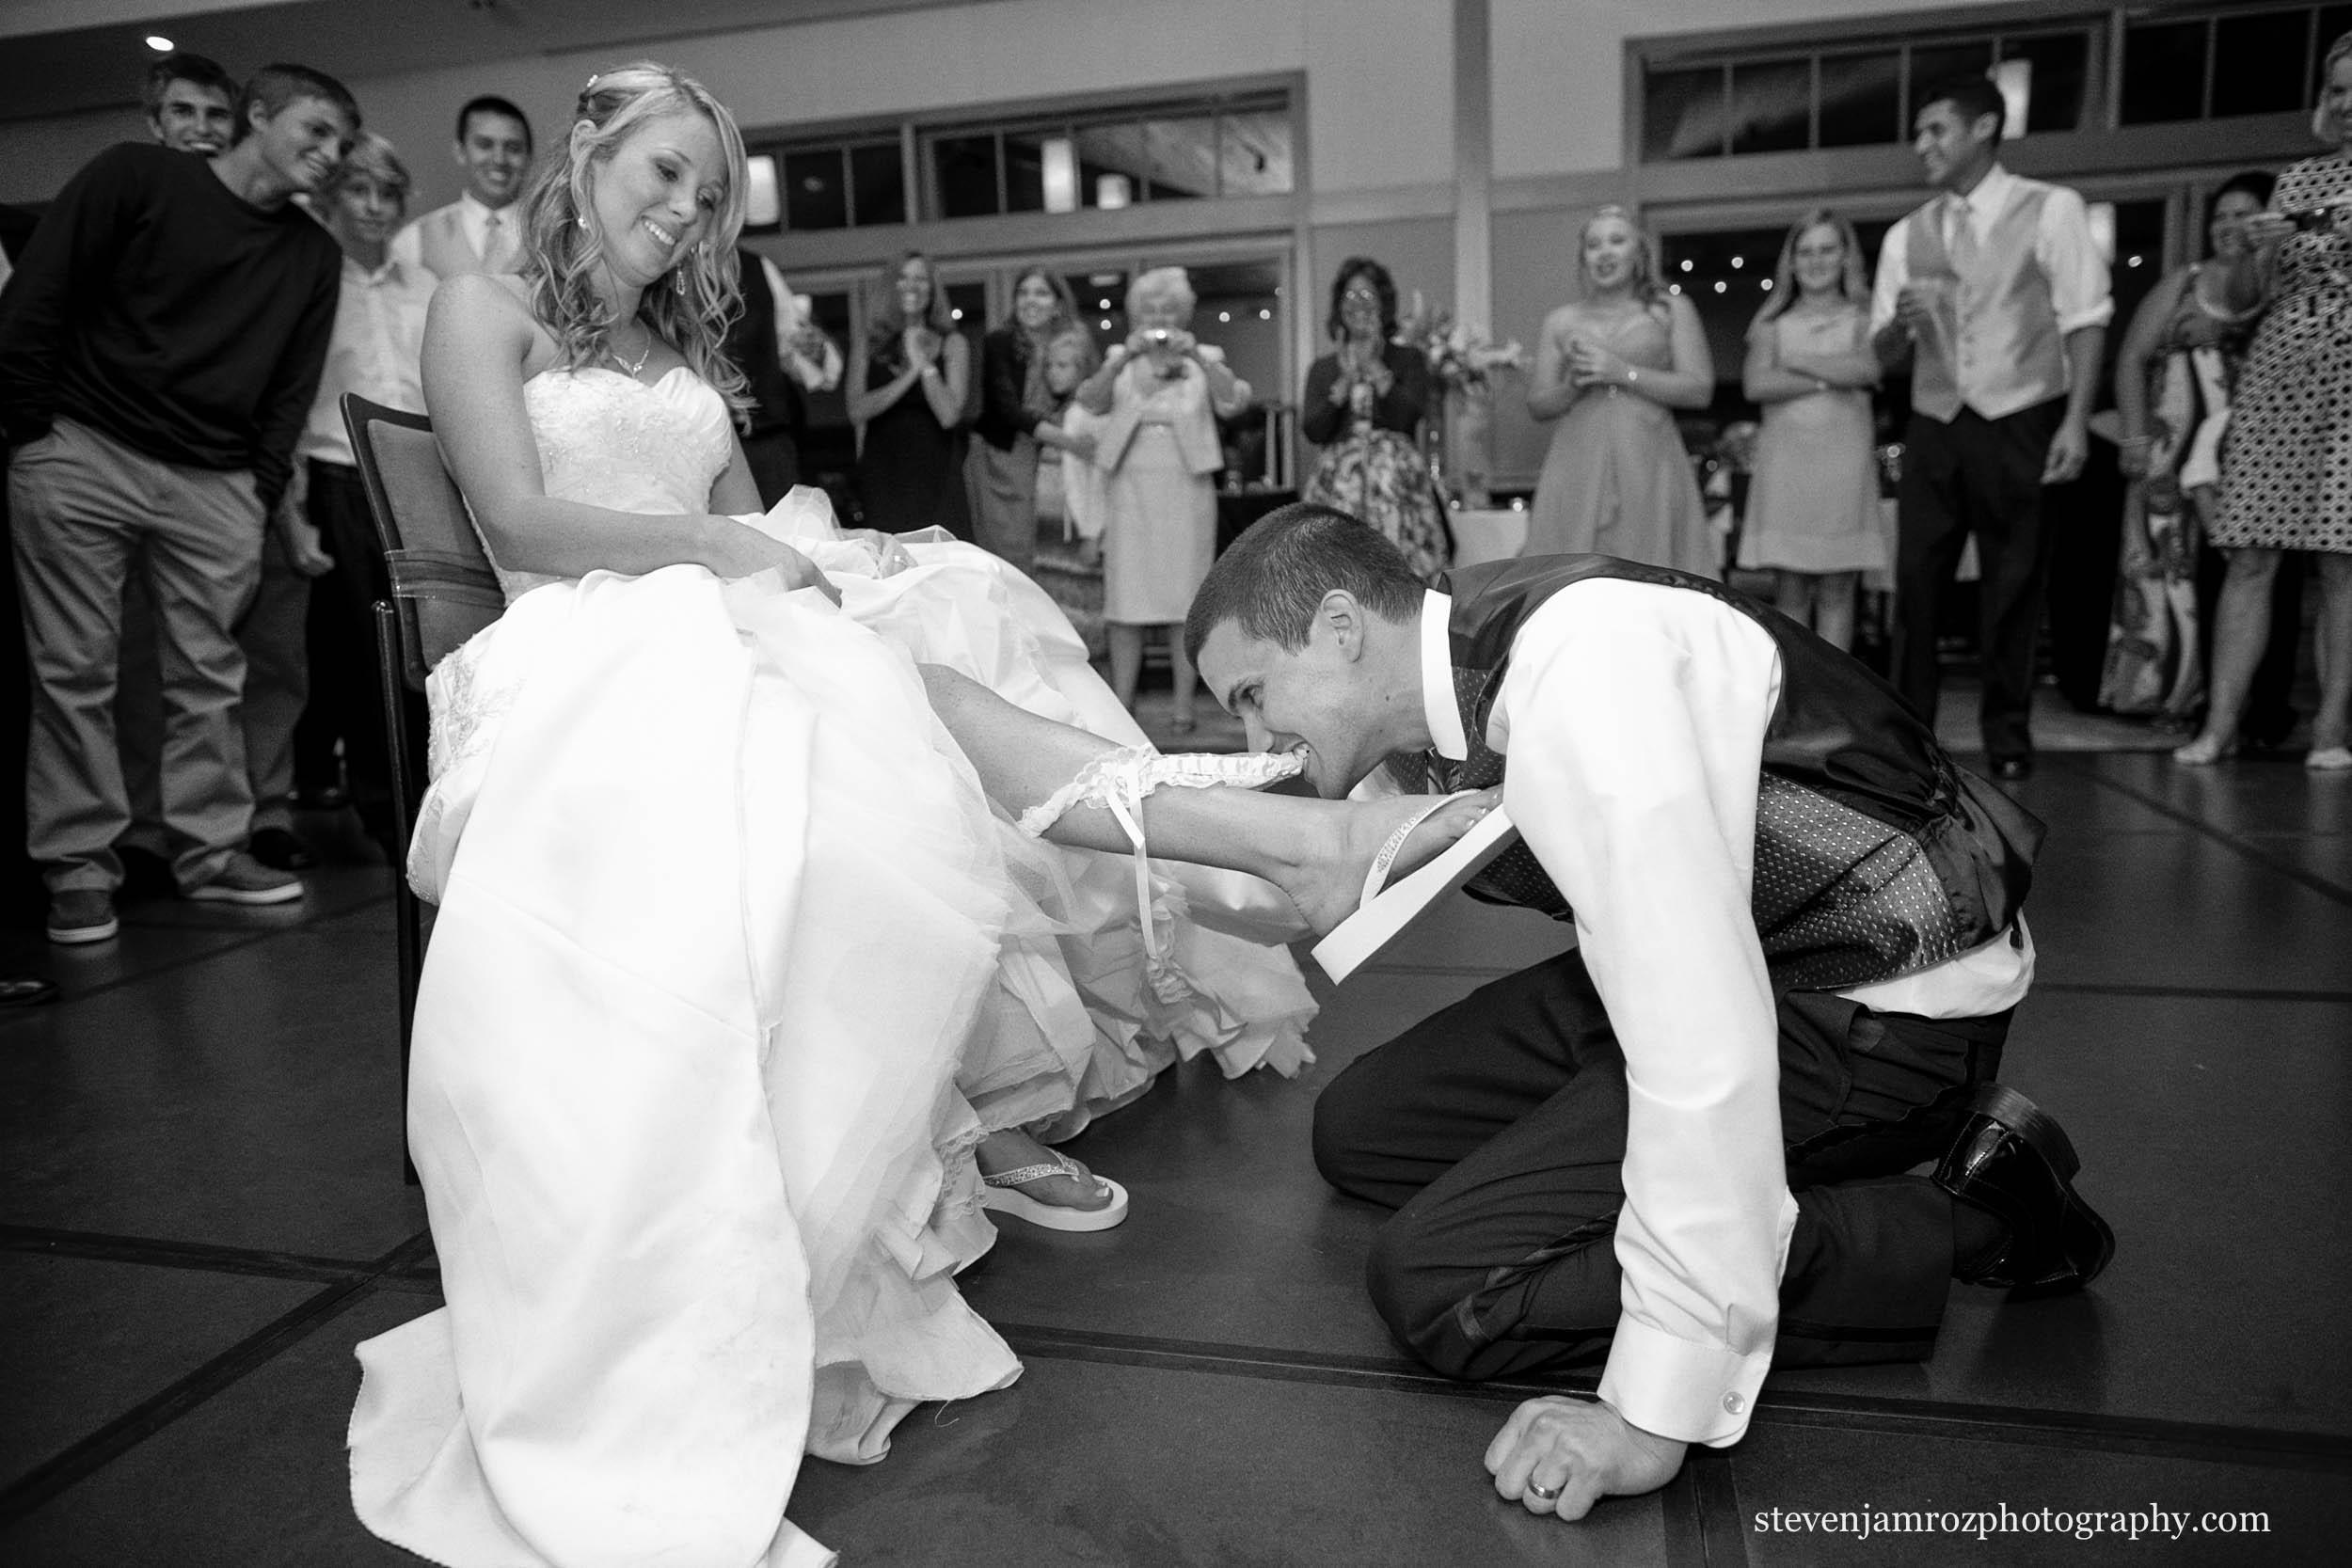 photojournalism-groom-pulls-off-garter-raleigh-steven-jamroz-photography-0405.jpg